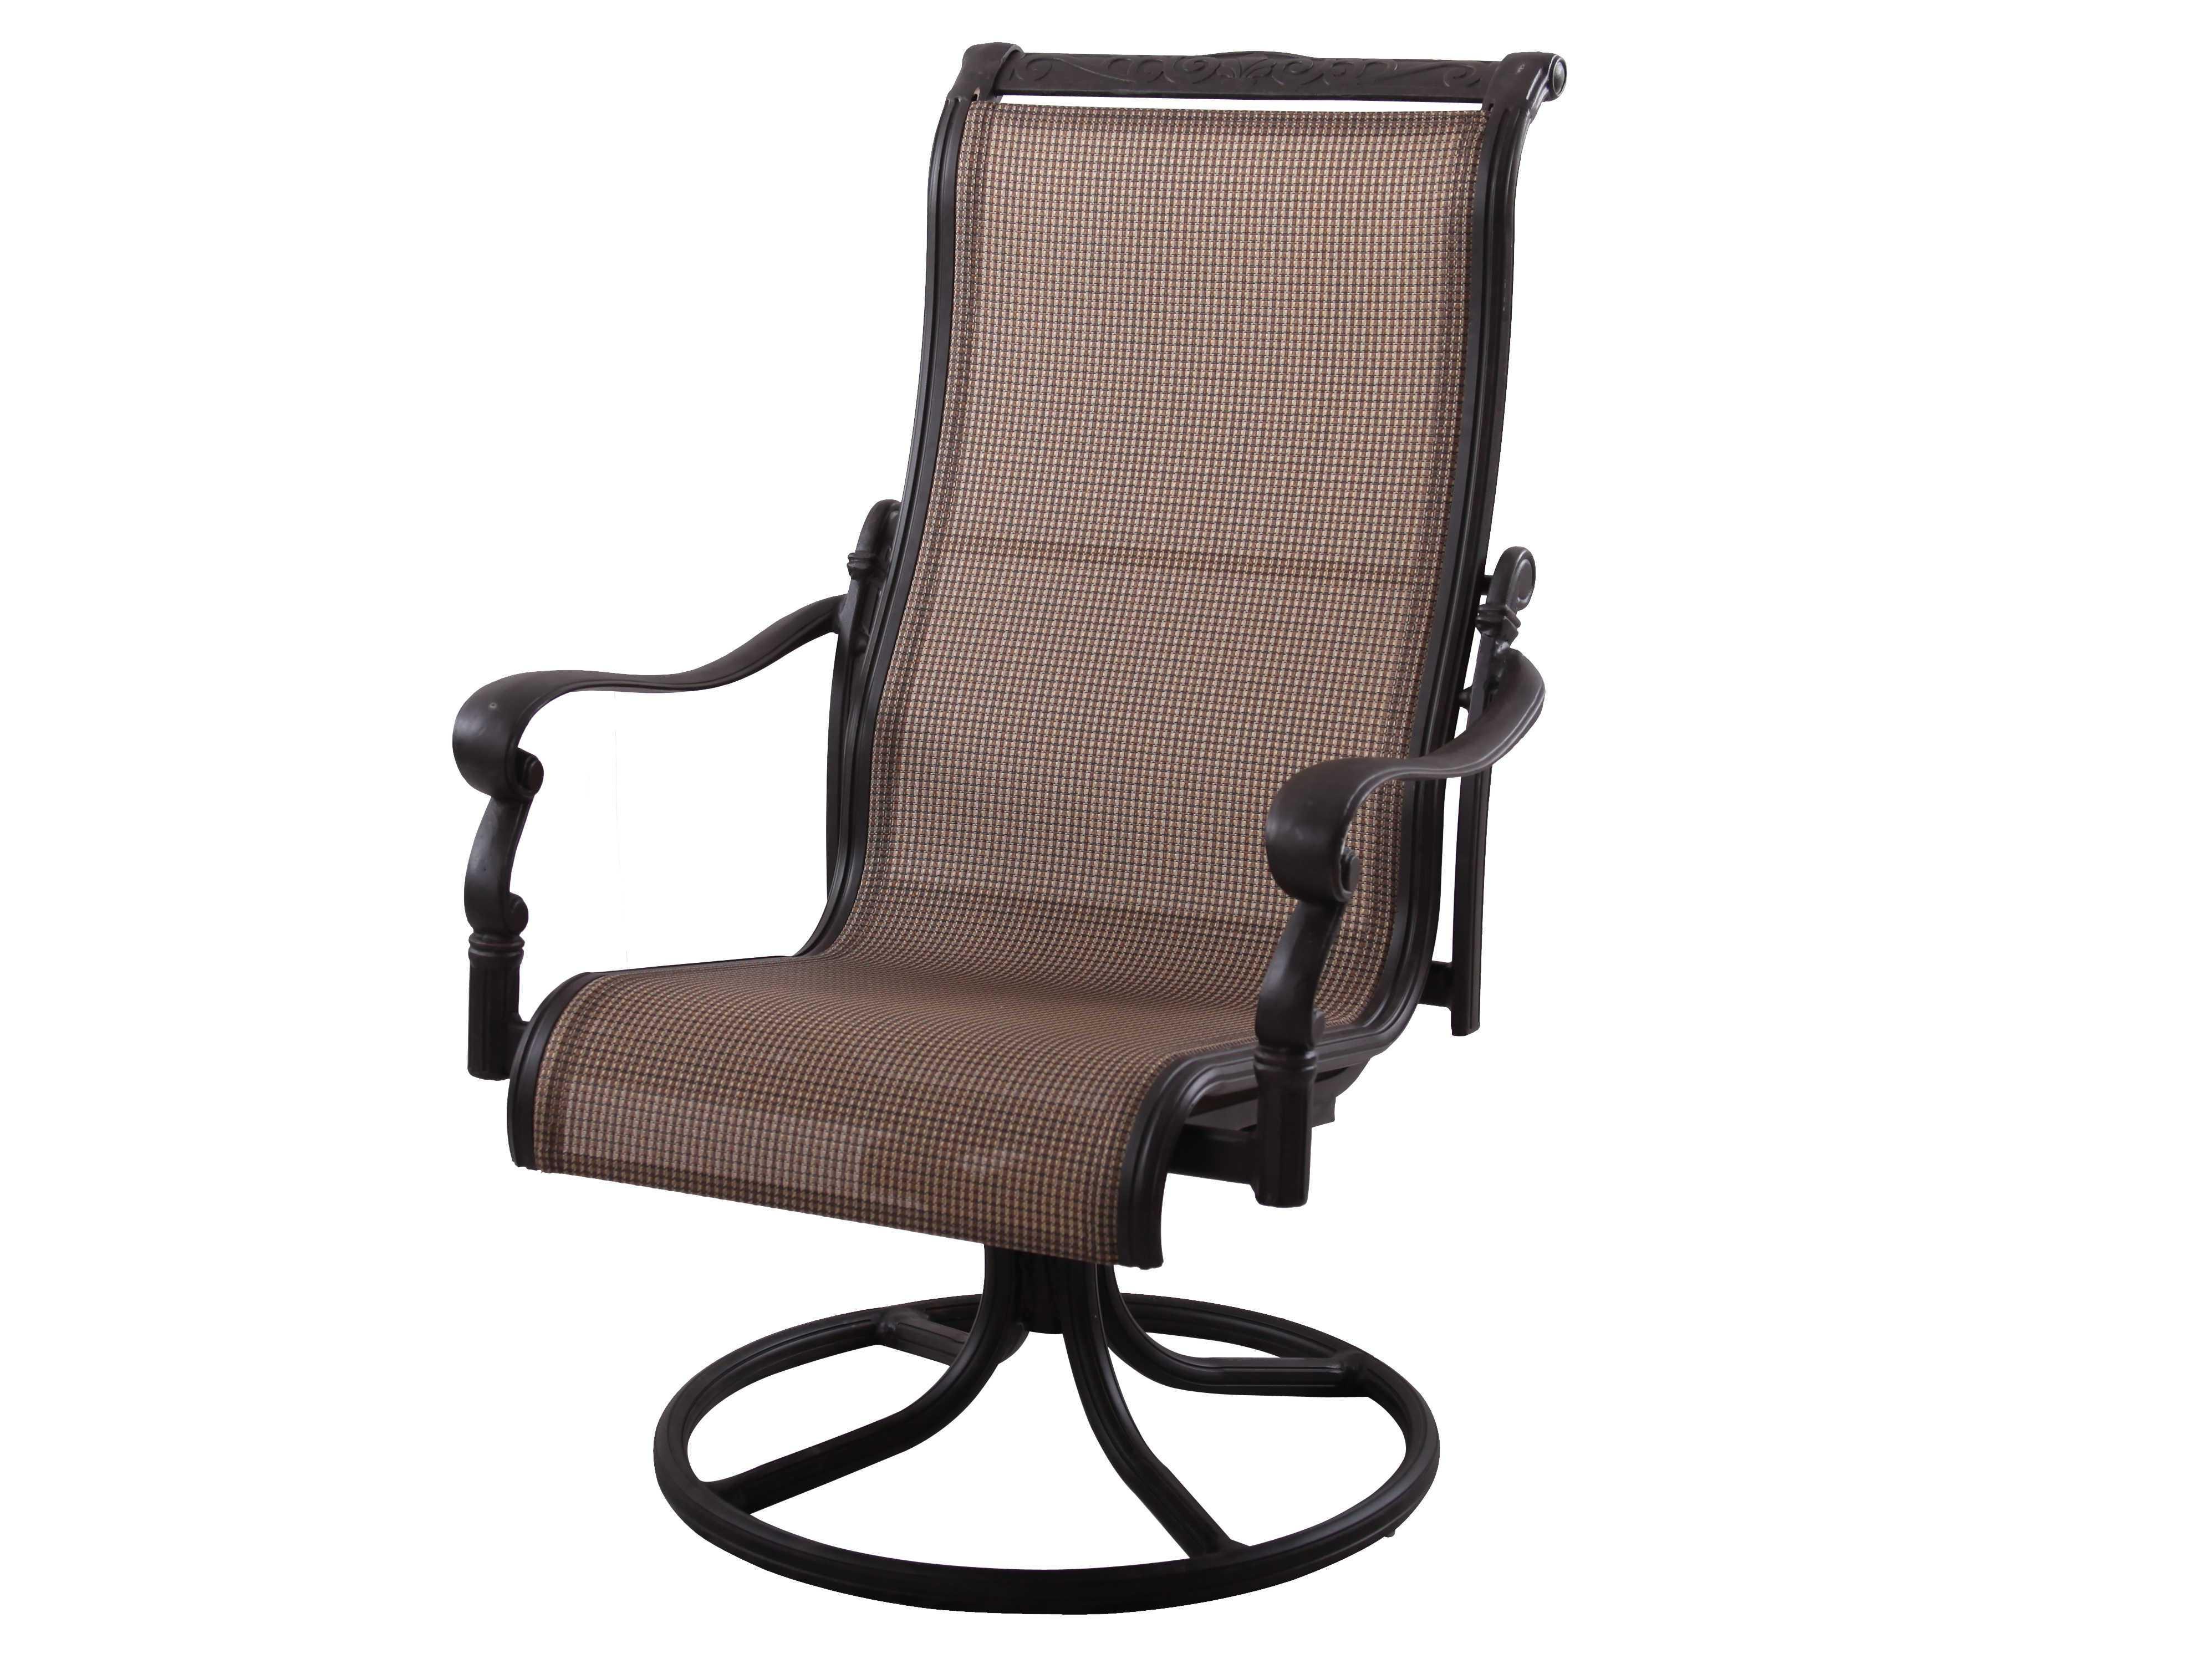 outdoor swivel rocker chair sheepskin covers nz darlee living standard monterey cast aluminum antique bronze hover to zoom